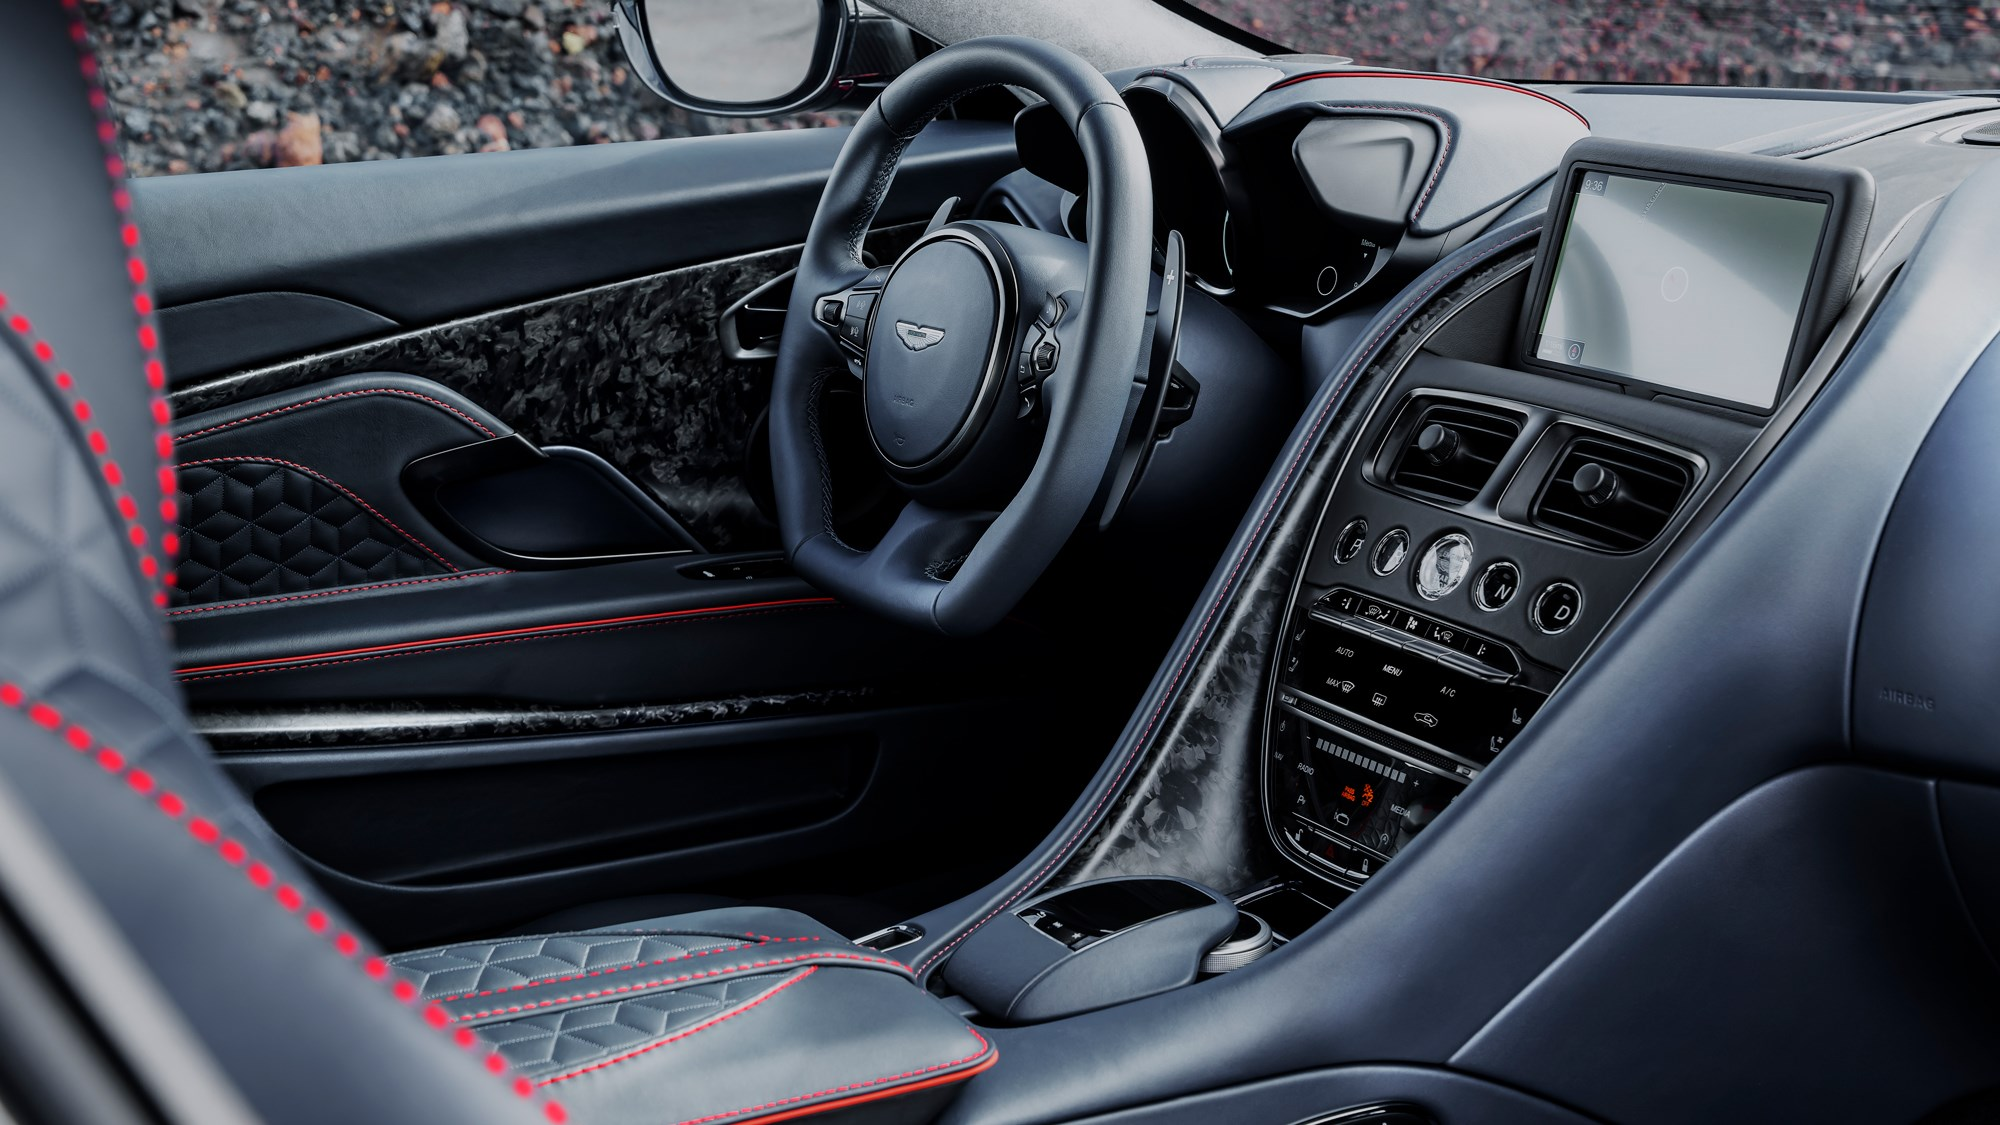 Aston Martin Dbs Superleggera Convertible Volante Is On The Way